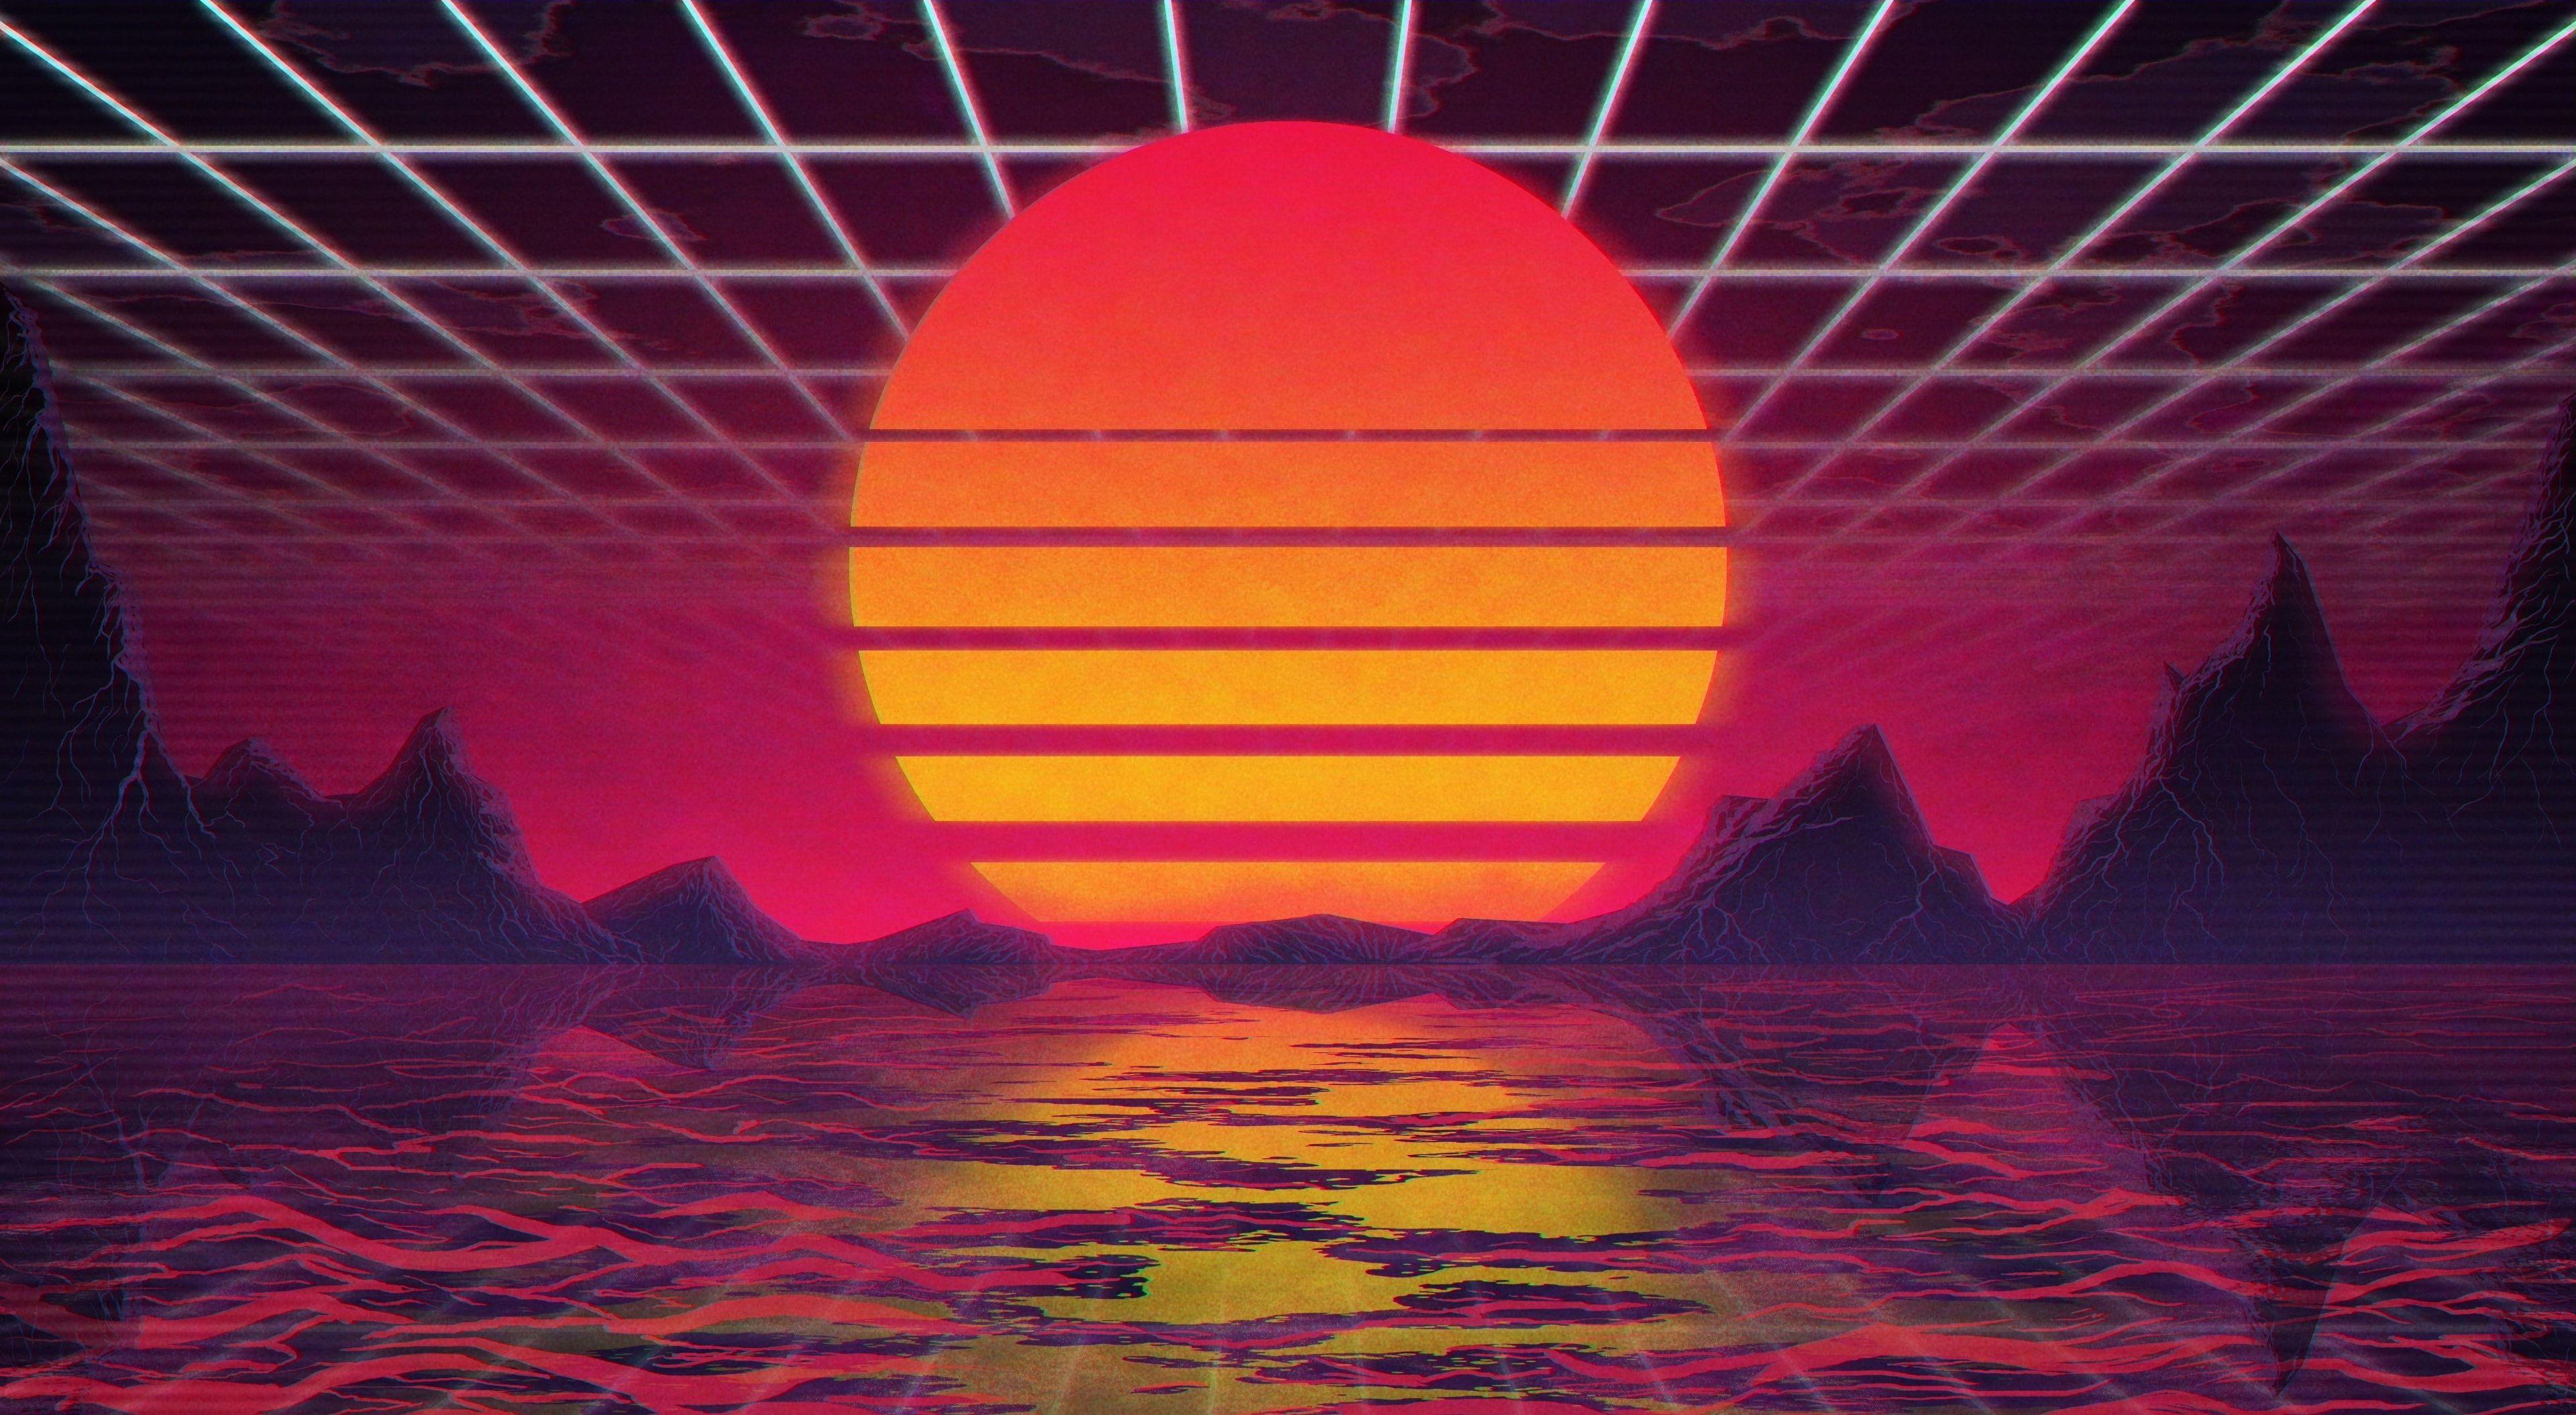 The Sun Music Star Background 80s Wallpaper Neon Vhs 80 S Synth Vaporwave Wallpaper Wallpaper Synthwave